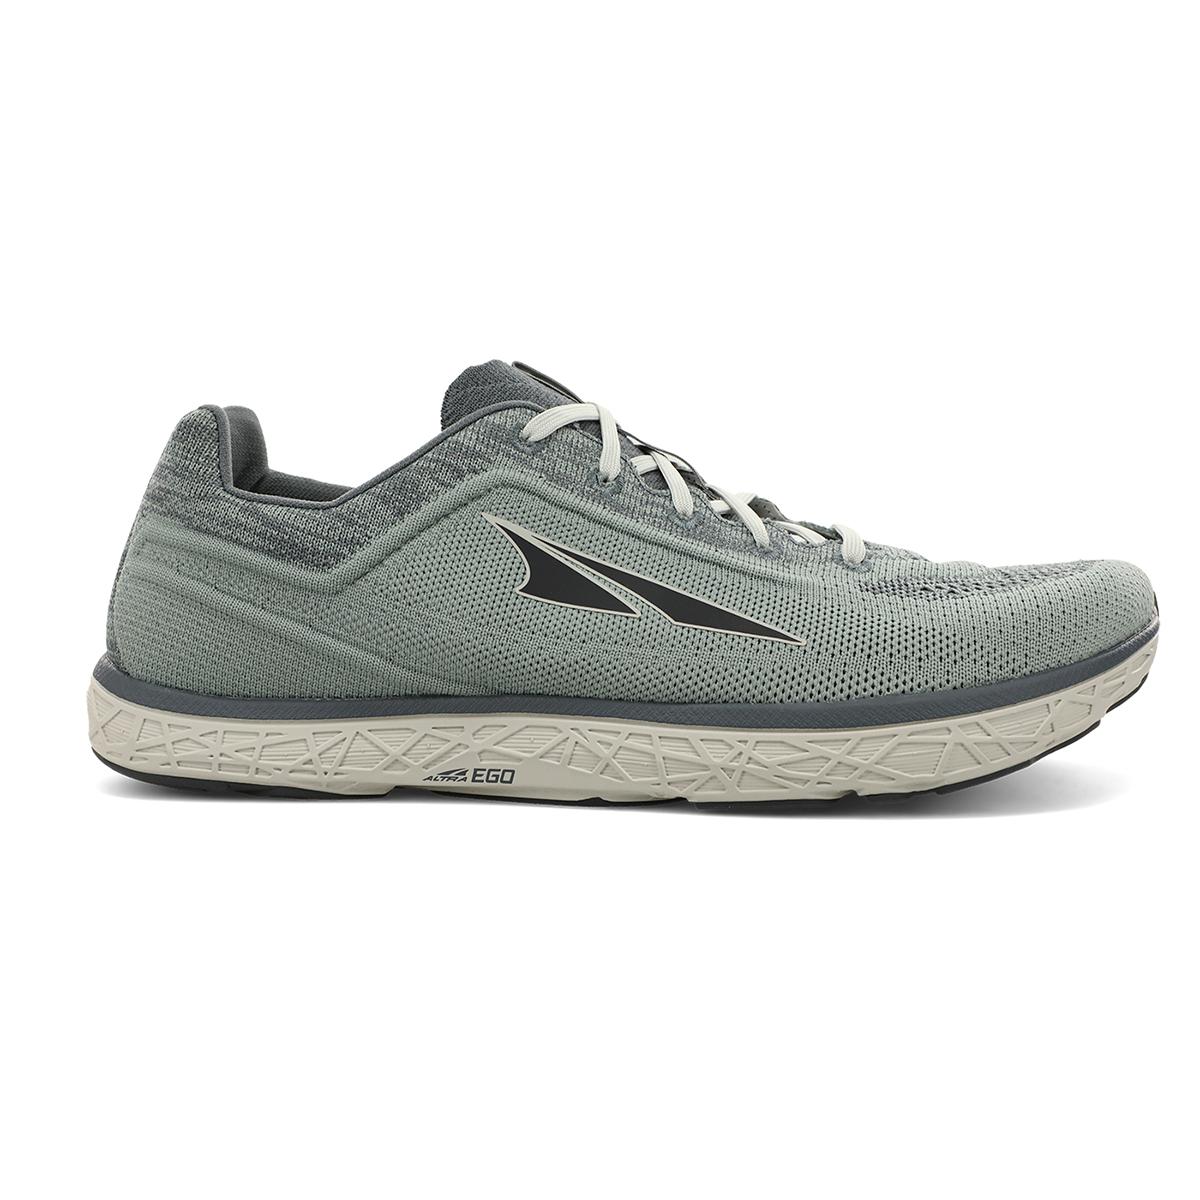 Men's Altra Escalante 2.5 Running Shoe - Color: Dark Slate - Size: 7 - Width: Regular, Dark Slate, large, image 1